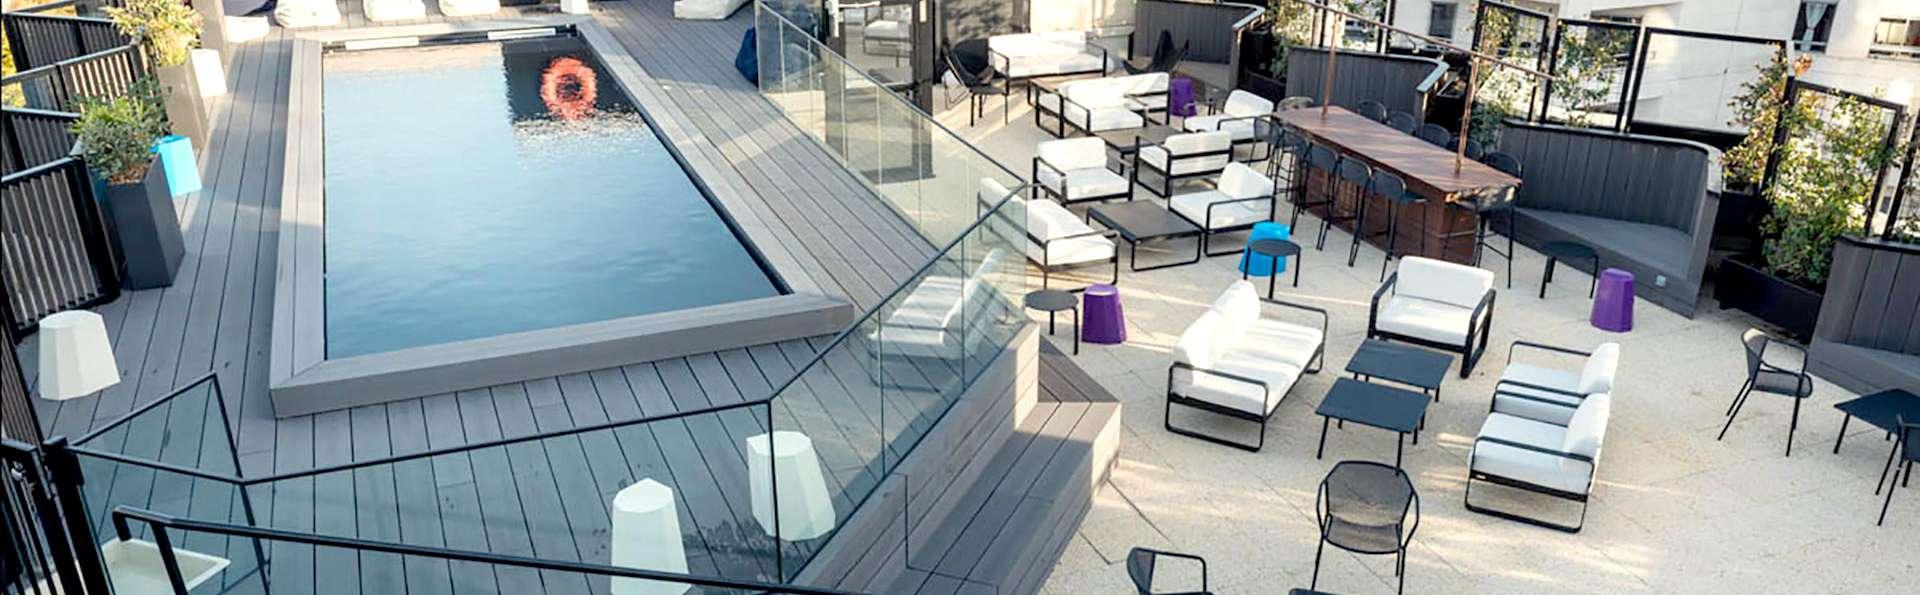 Mercure Paris Boulogne - Edit_Pool.jpg